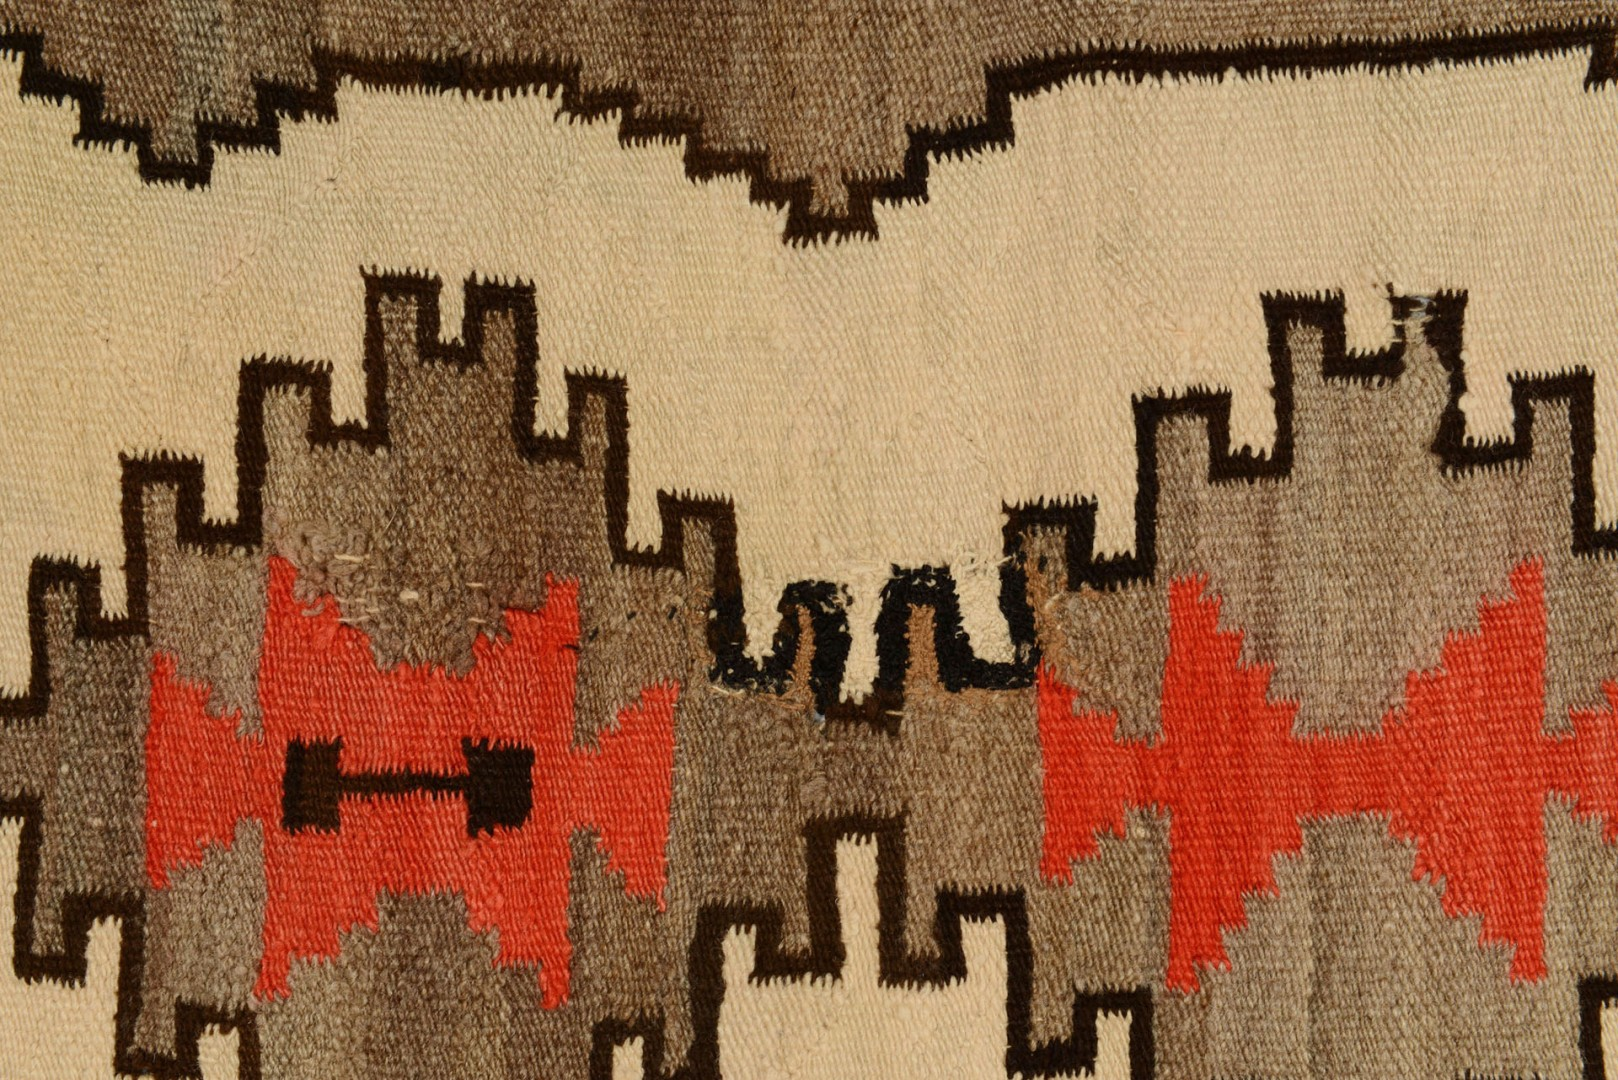 Lot 566: Grouping of 3 Navajo Weavings